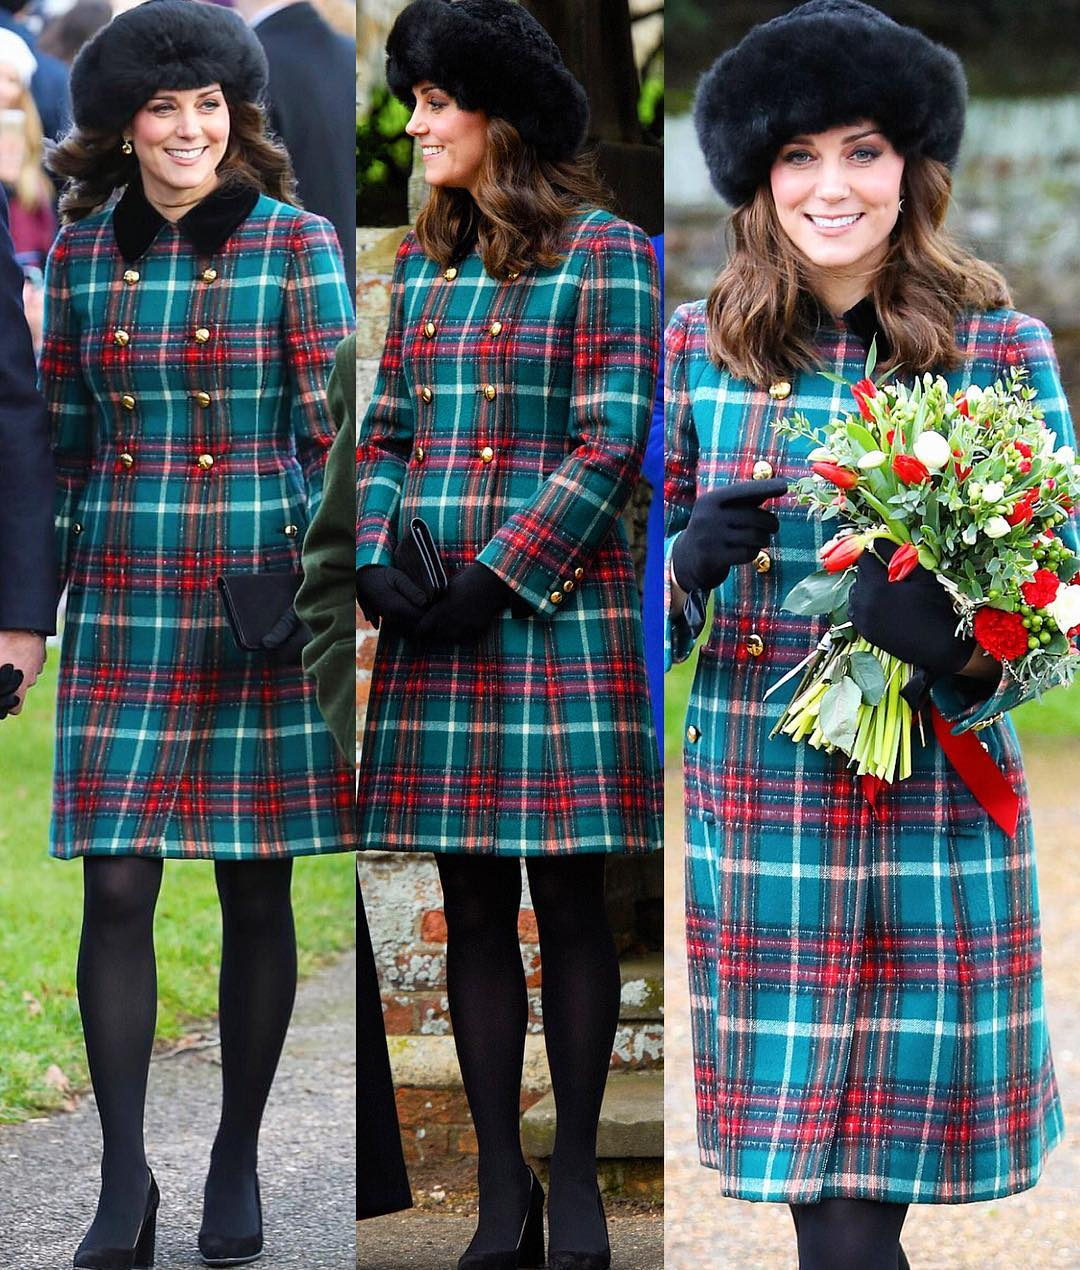 Meghan Markle e Kate Middleton  i look a Natale - VelvetStyle 97ceaad92d06